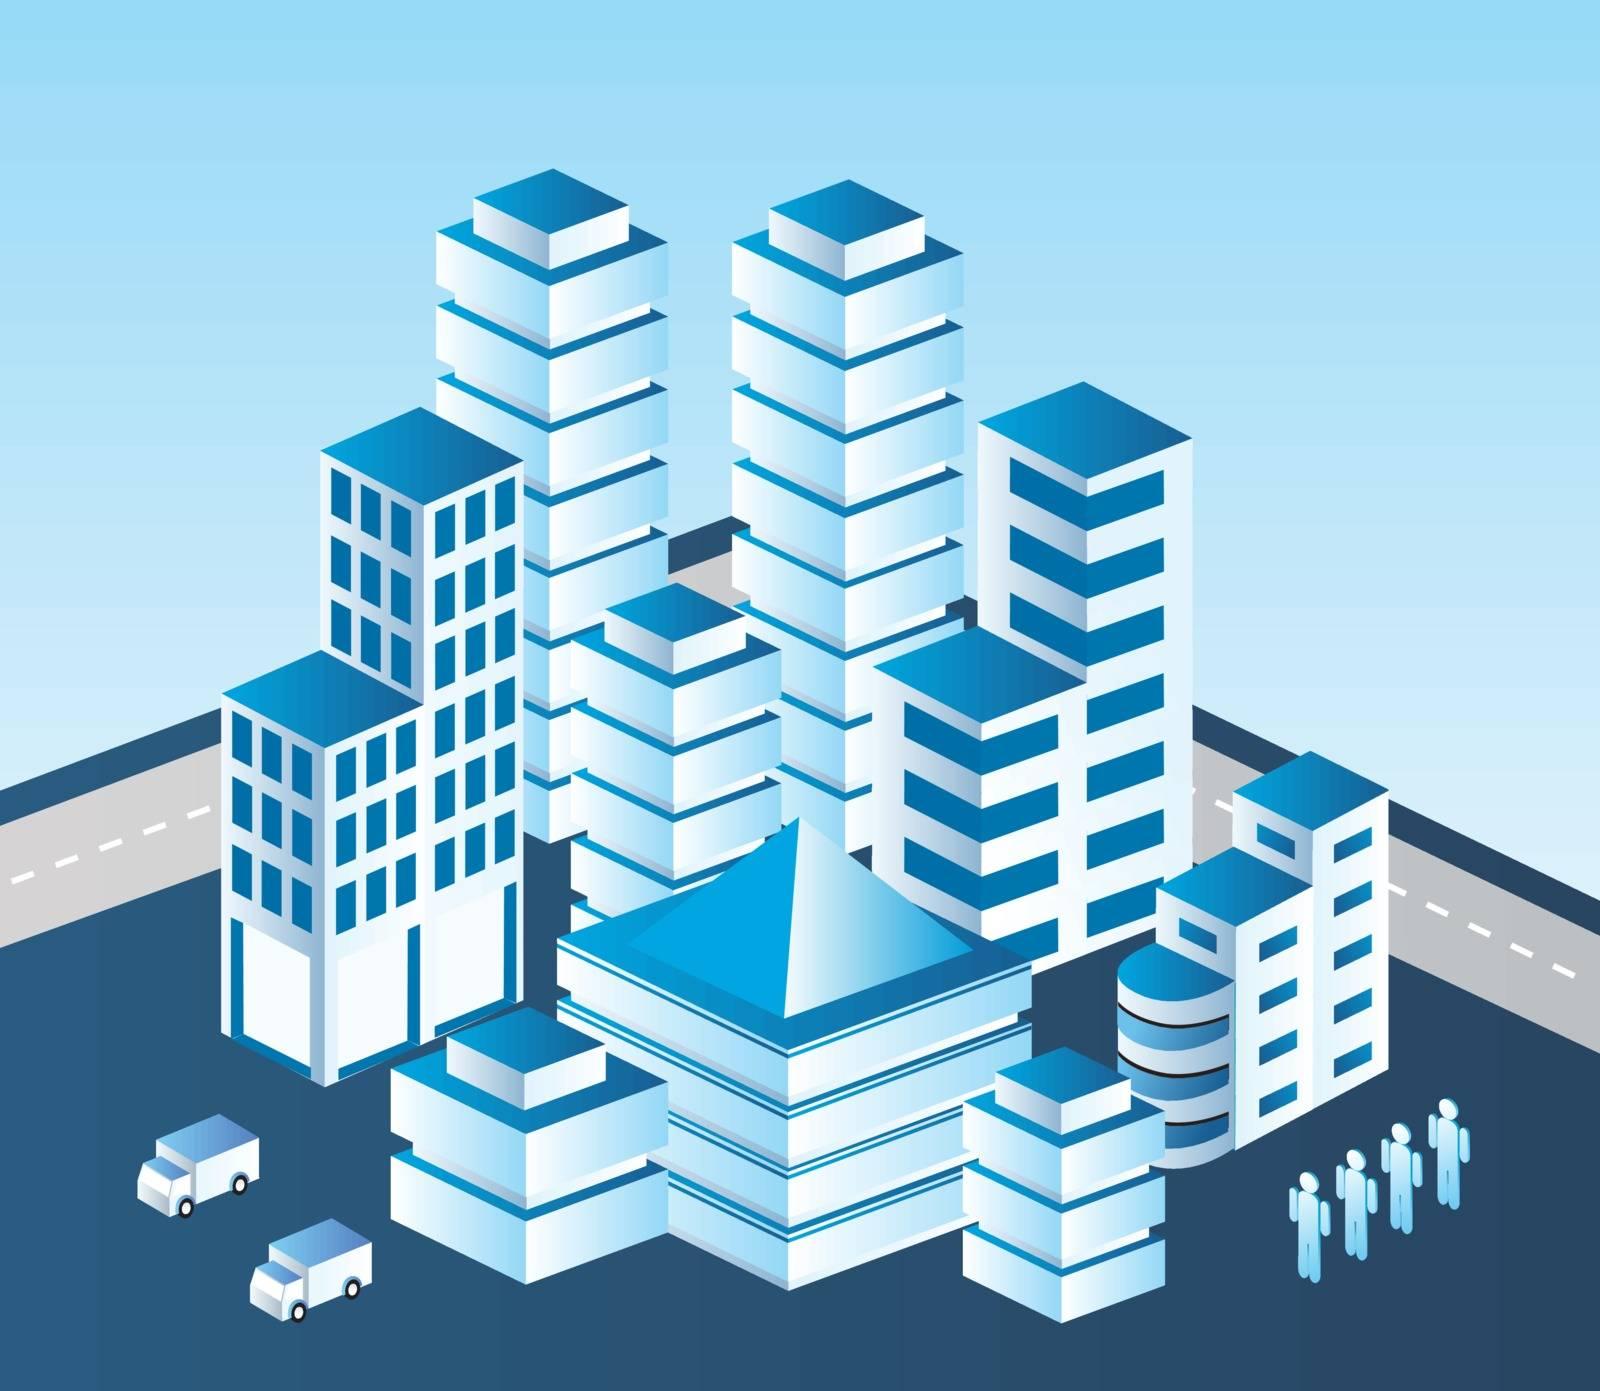 Isometric vector city in blue tones